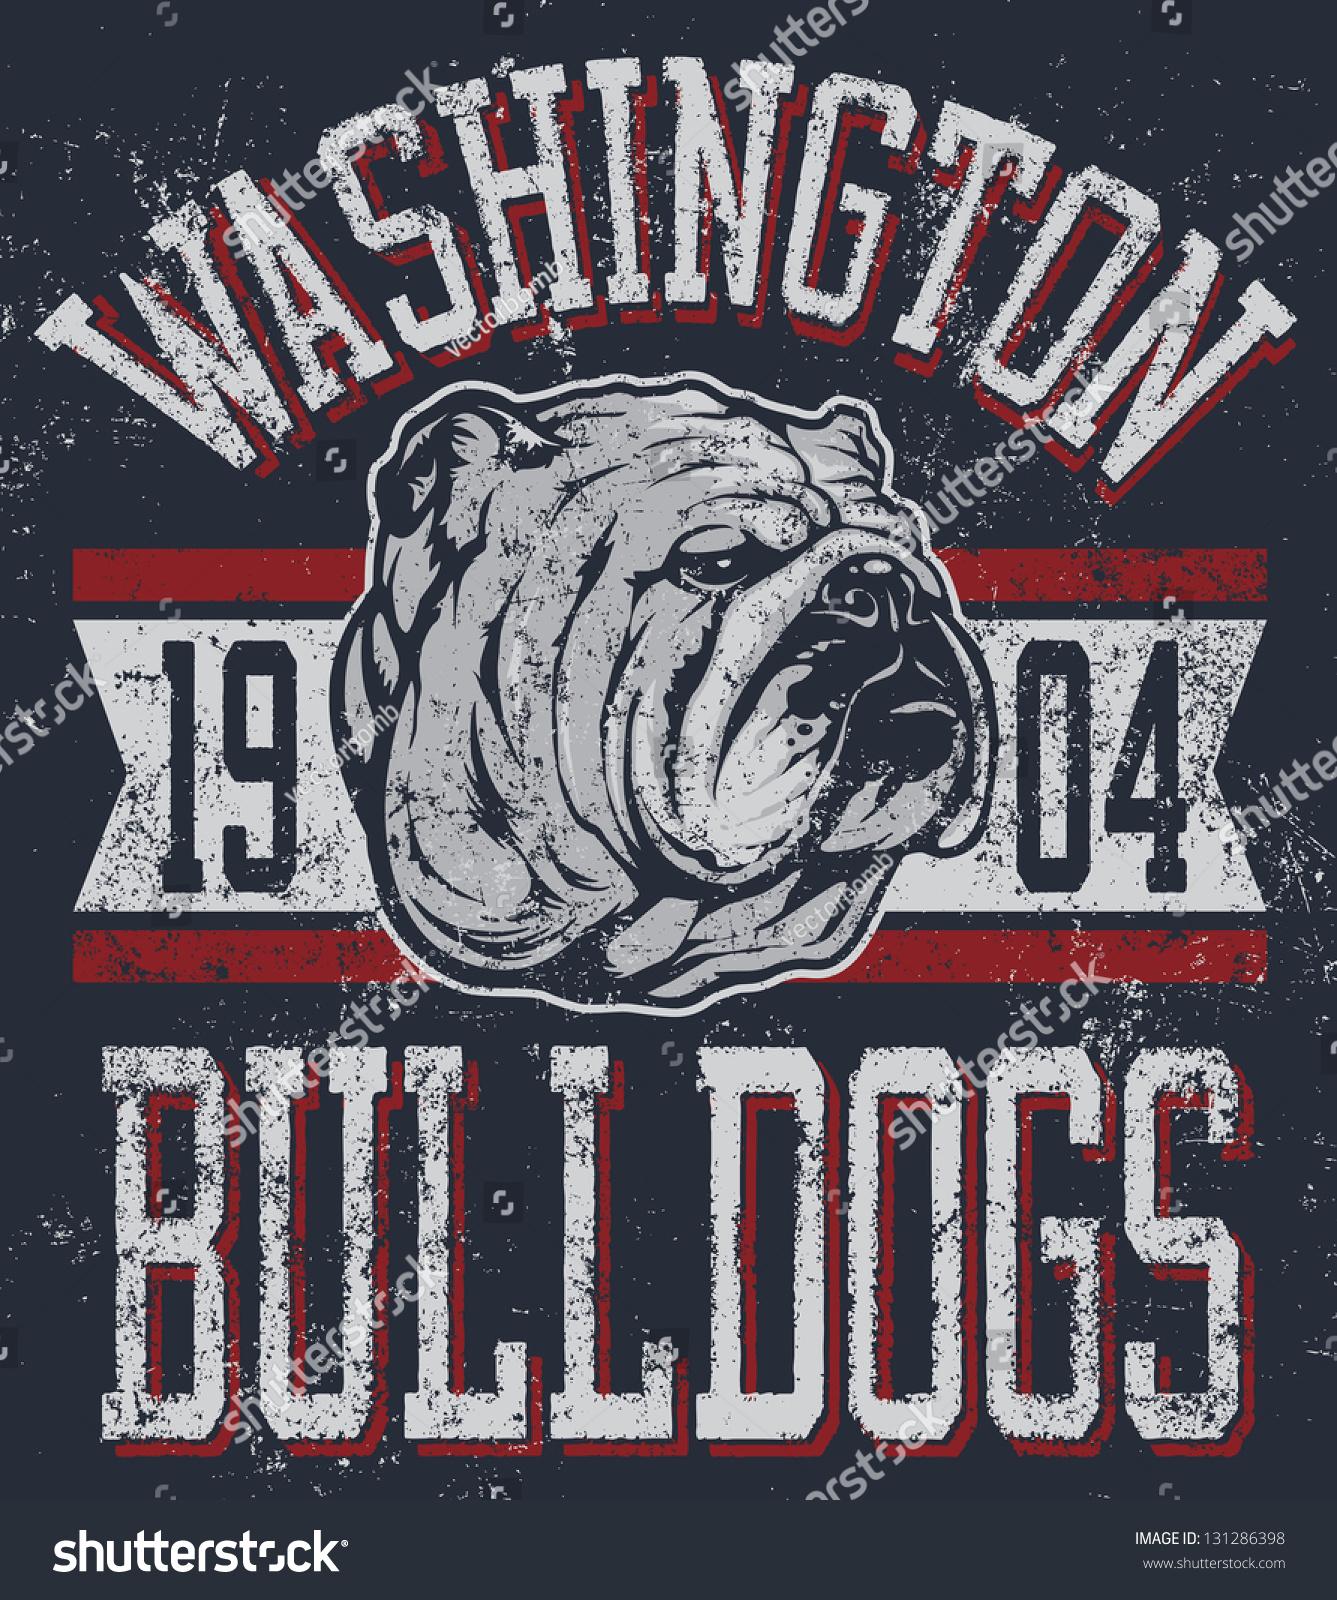 Shirt design course - Three Color Retro Bulldogs Athletic T Shirt Design Complete With Bulldog Mascot Vector